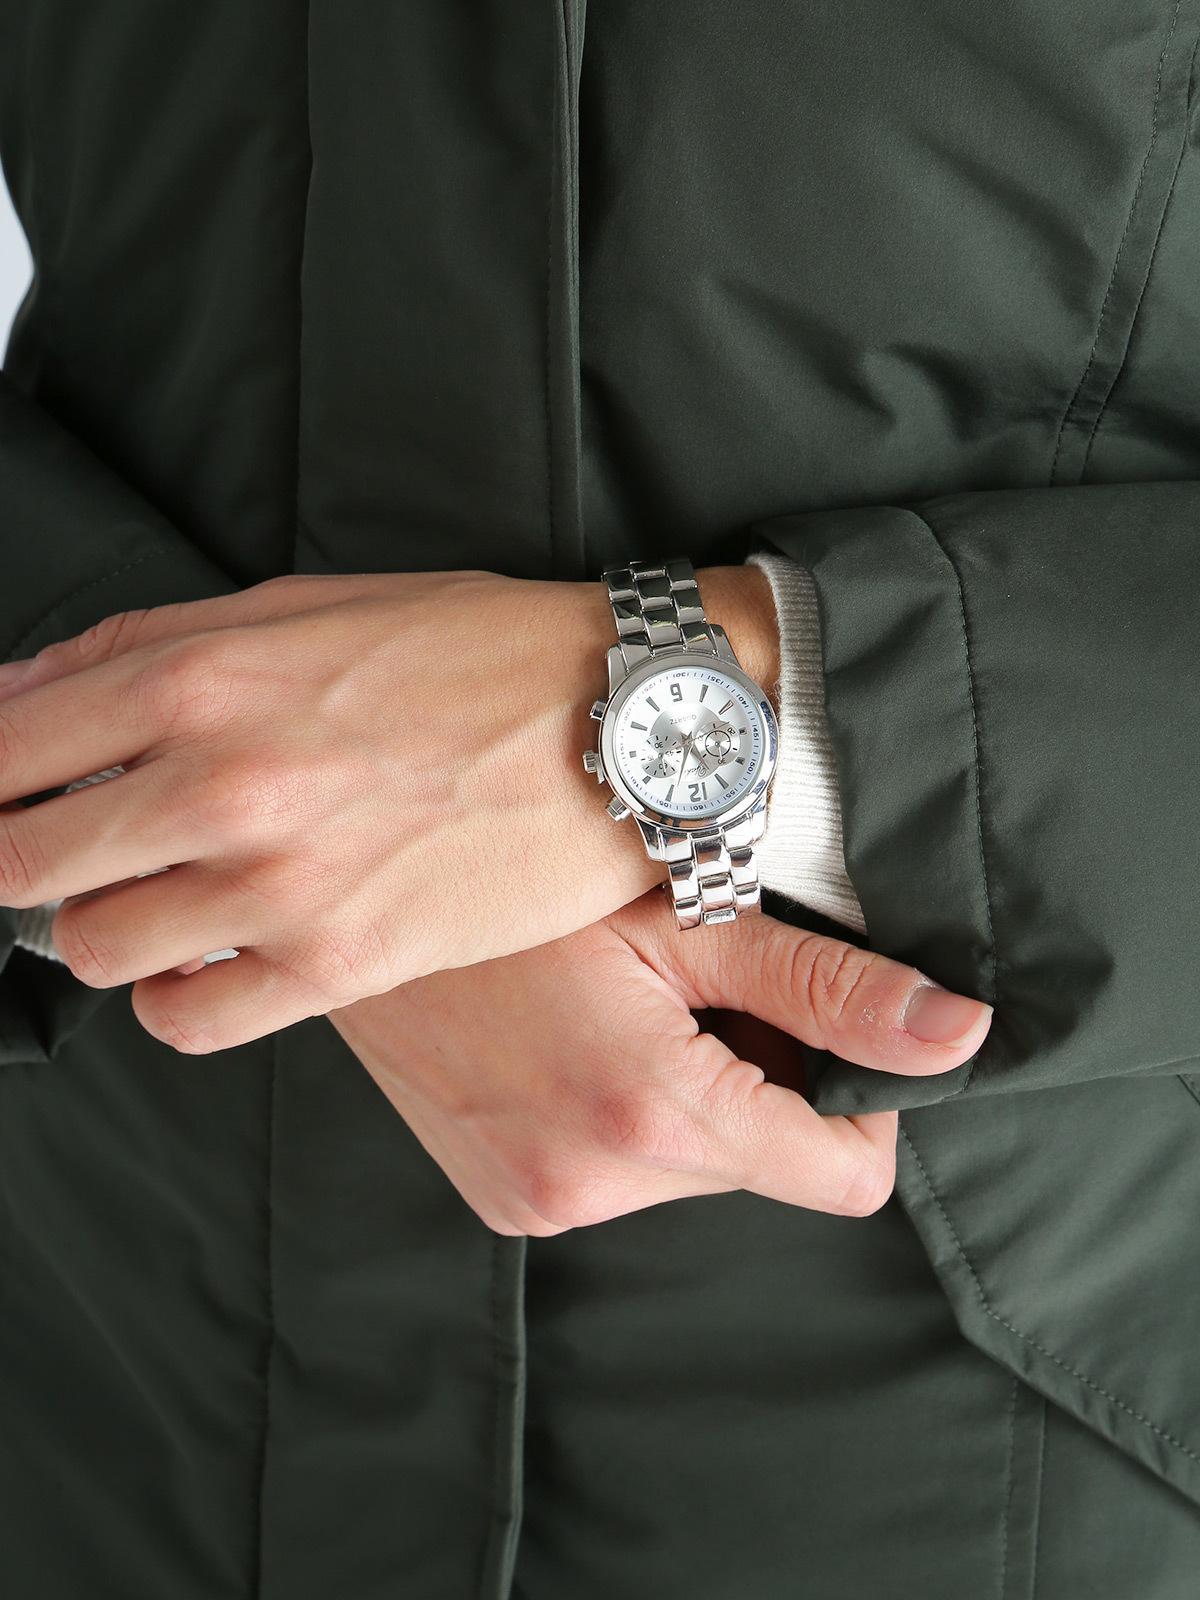 Orologio da polso al quarzo solada | MecShopping